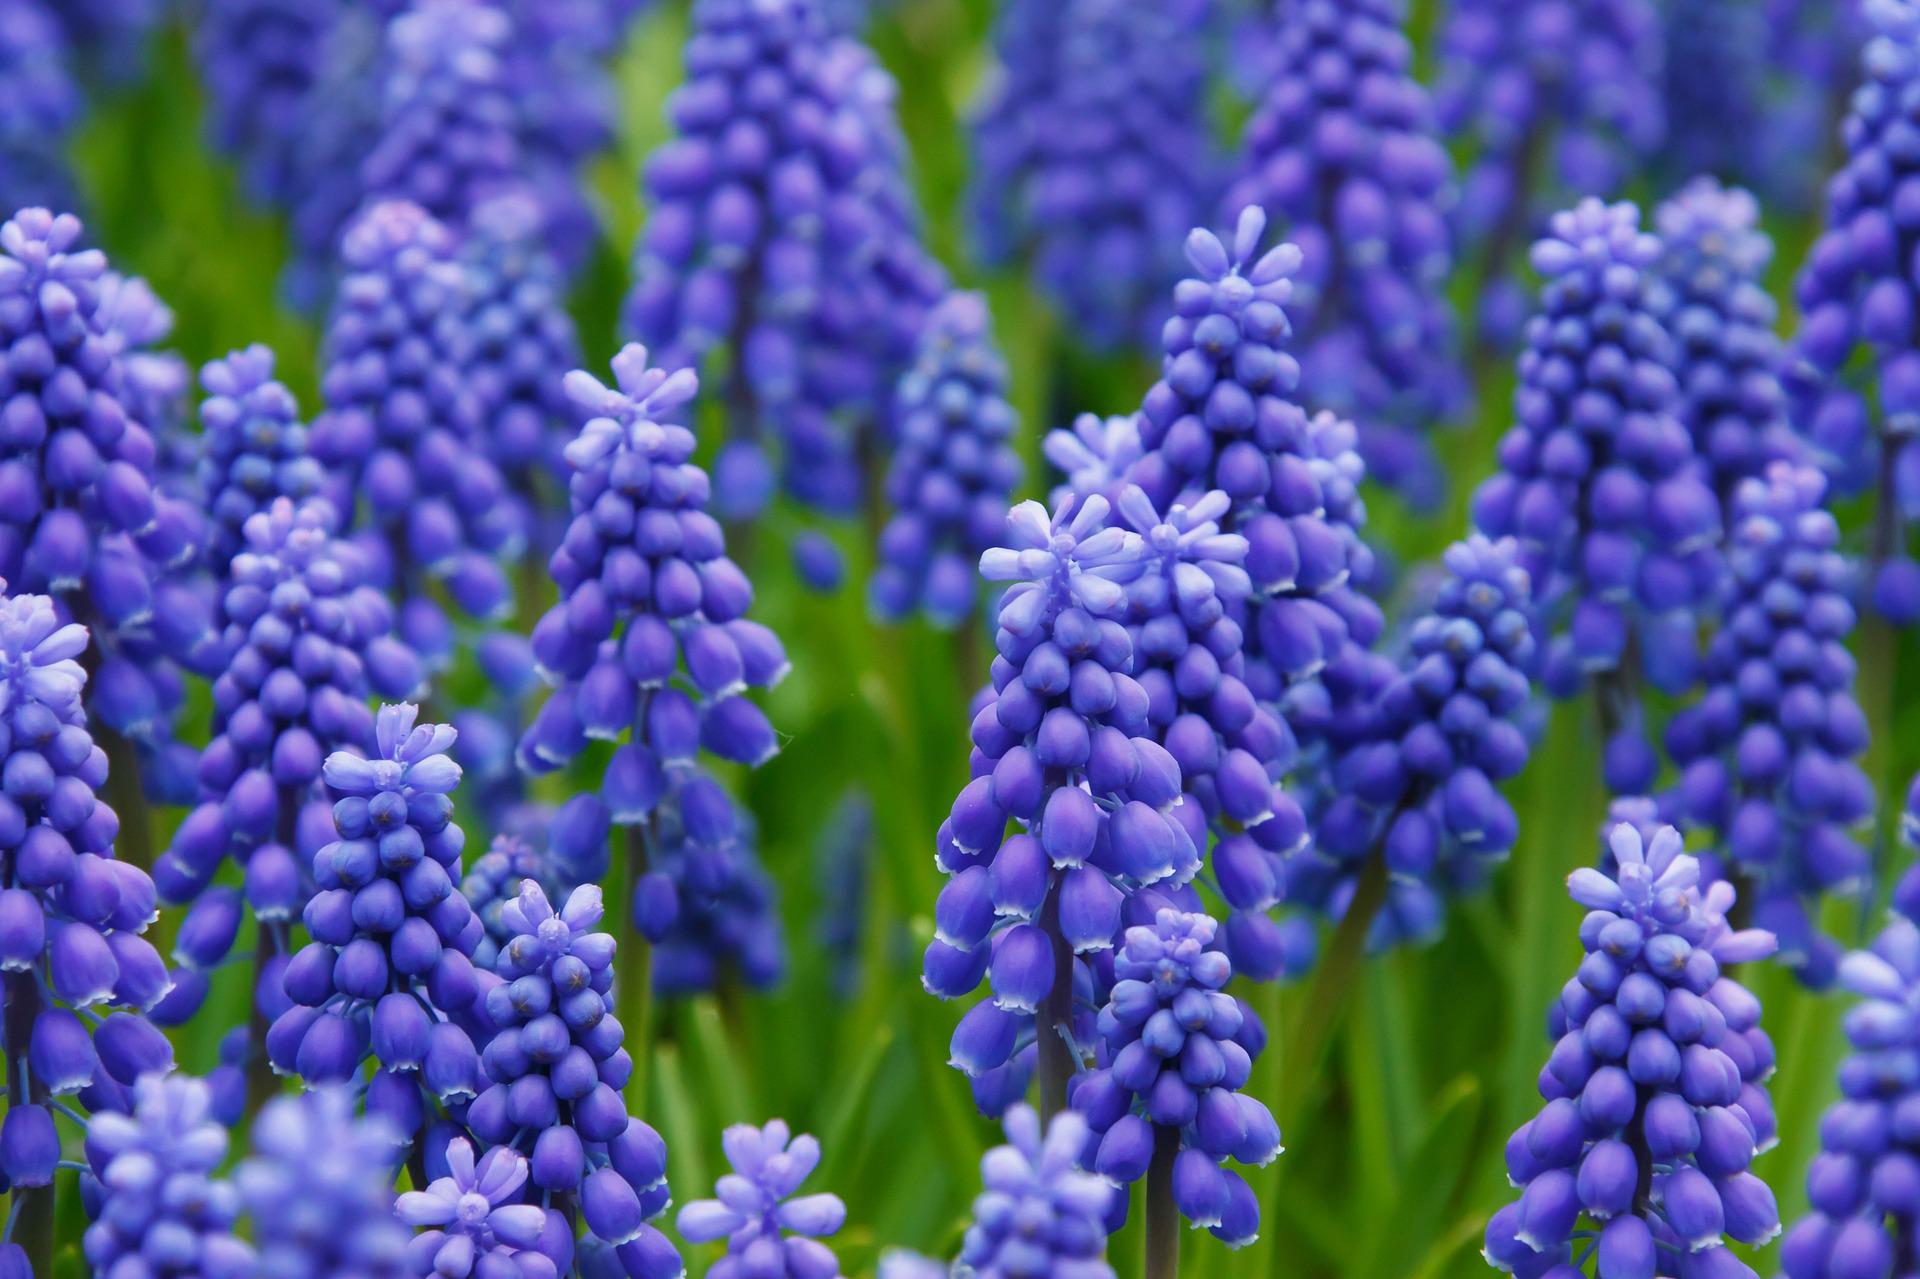 hyacinth-best-uk-london-spring-flowers-london-florist-flowers-24-hours